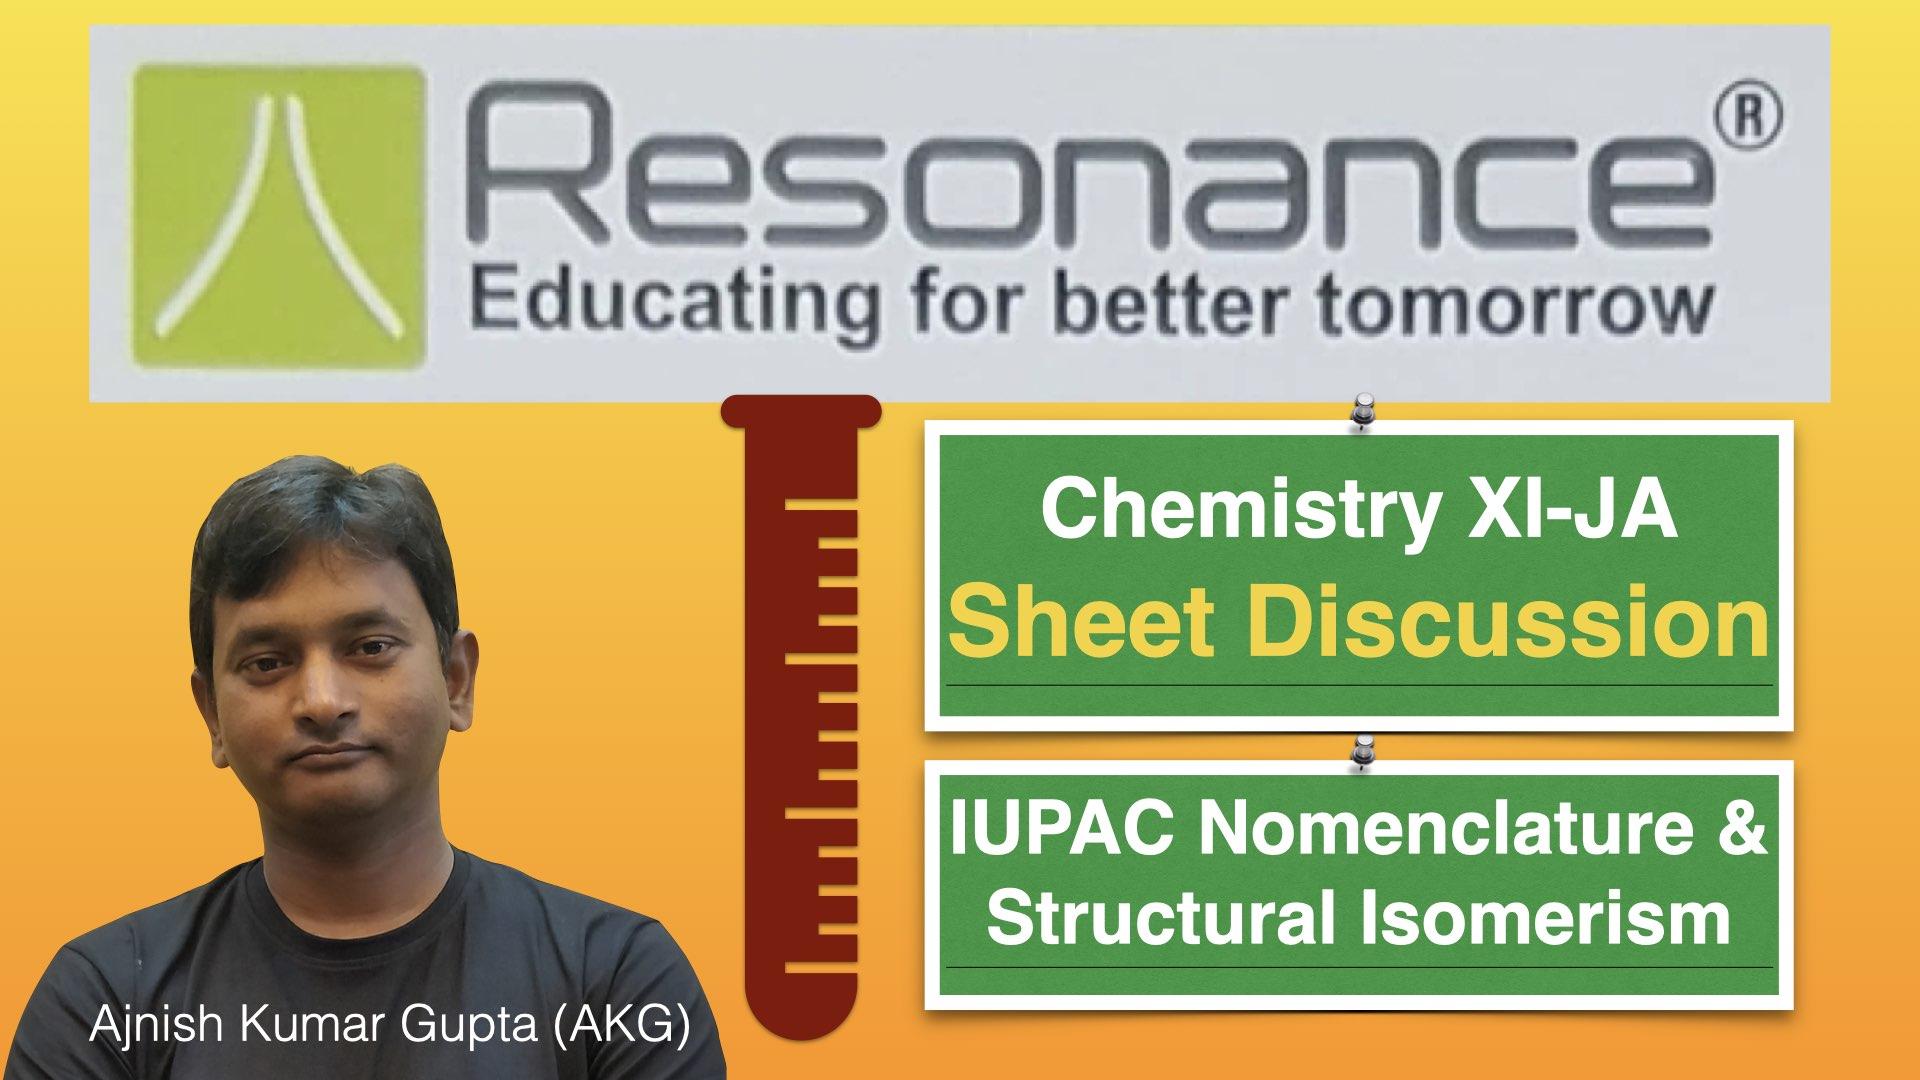 Sheet Discussion XI-JA (IUPAC Nomenclature & Structural Isomerism)